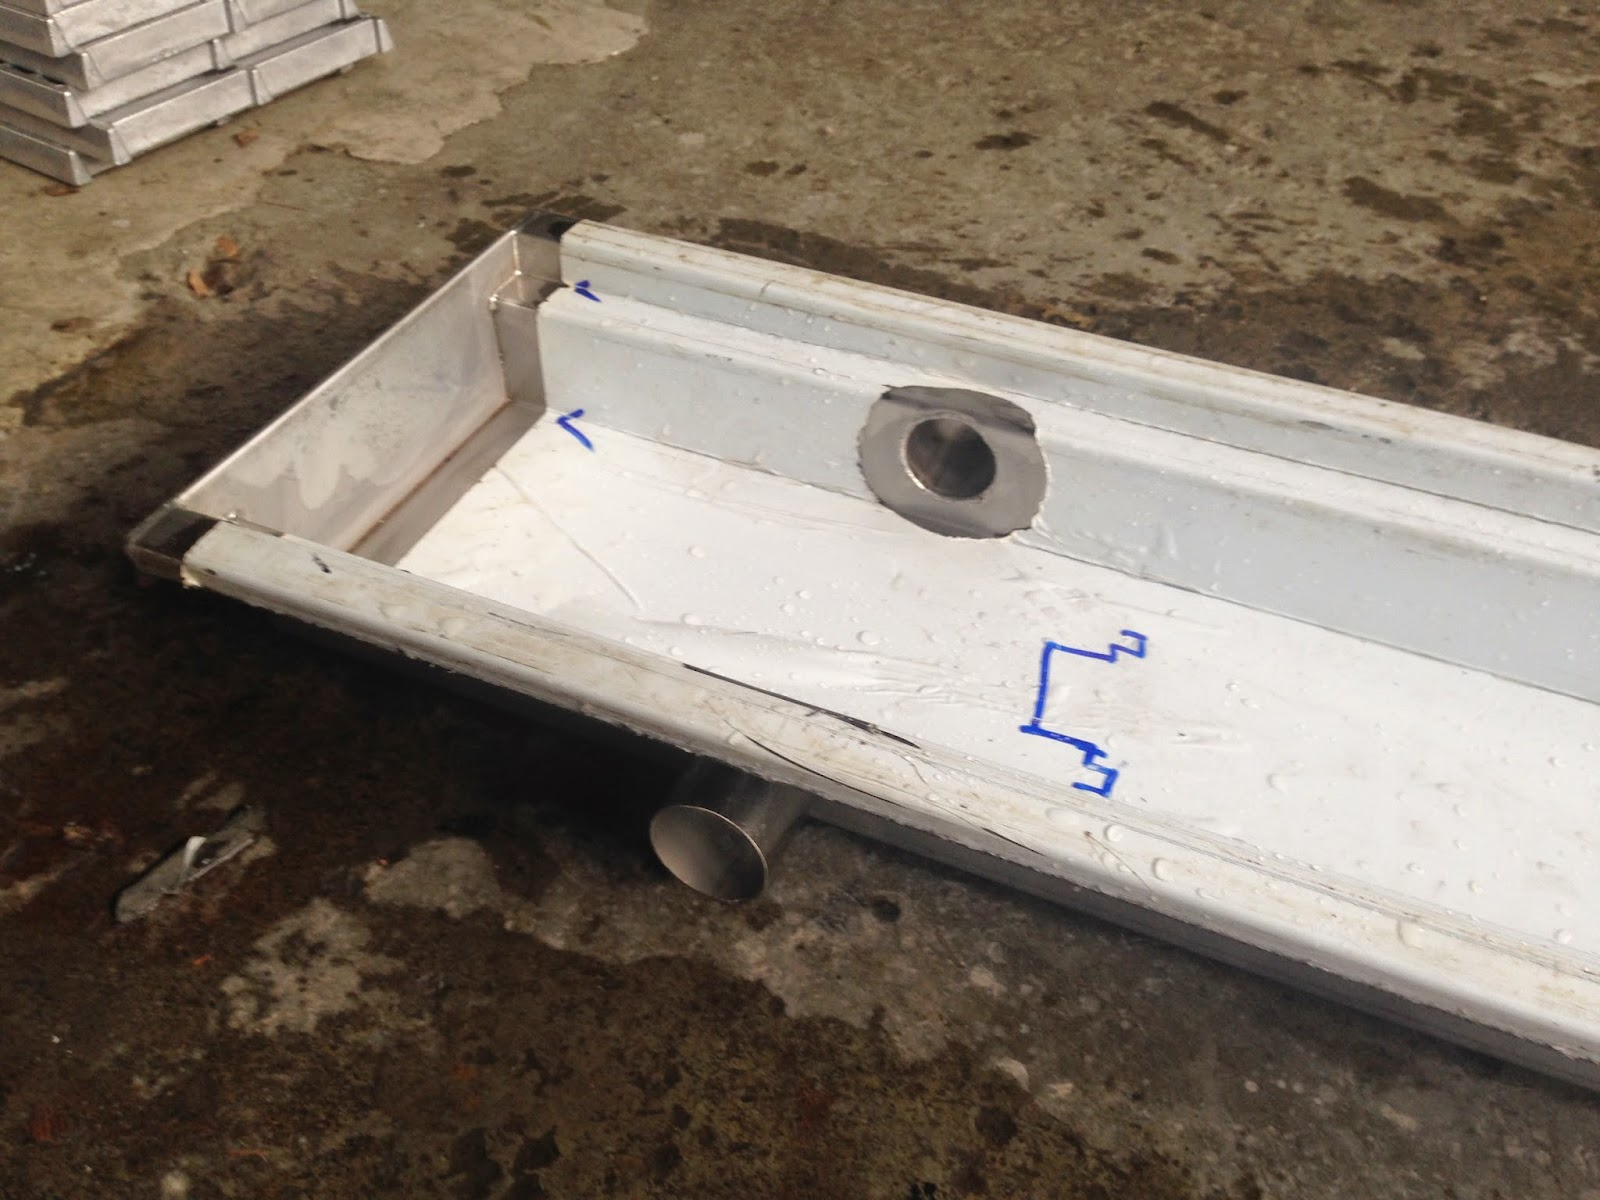 24 Kitchen Sink Swanstone Single Bowl 白鐵水溝、水溝蓋、截油槽、排水溝 @. - Nidbox親子盒子